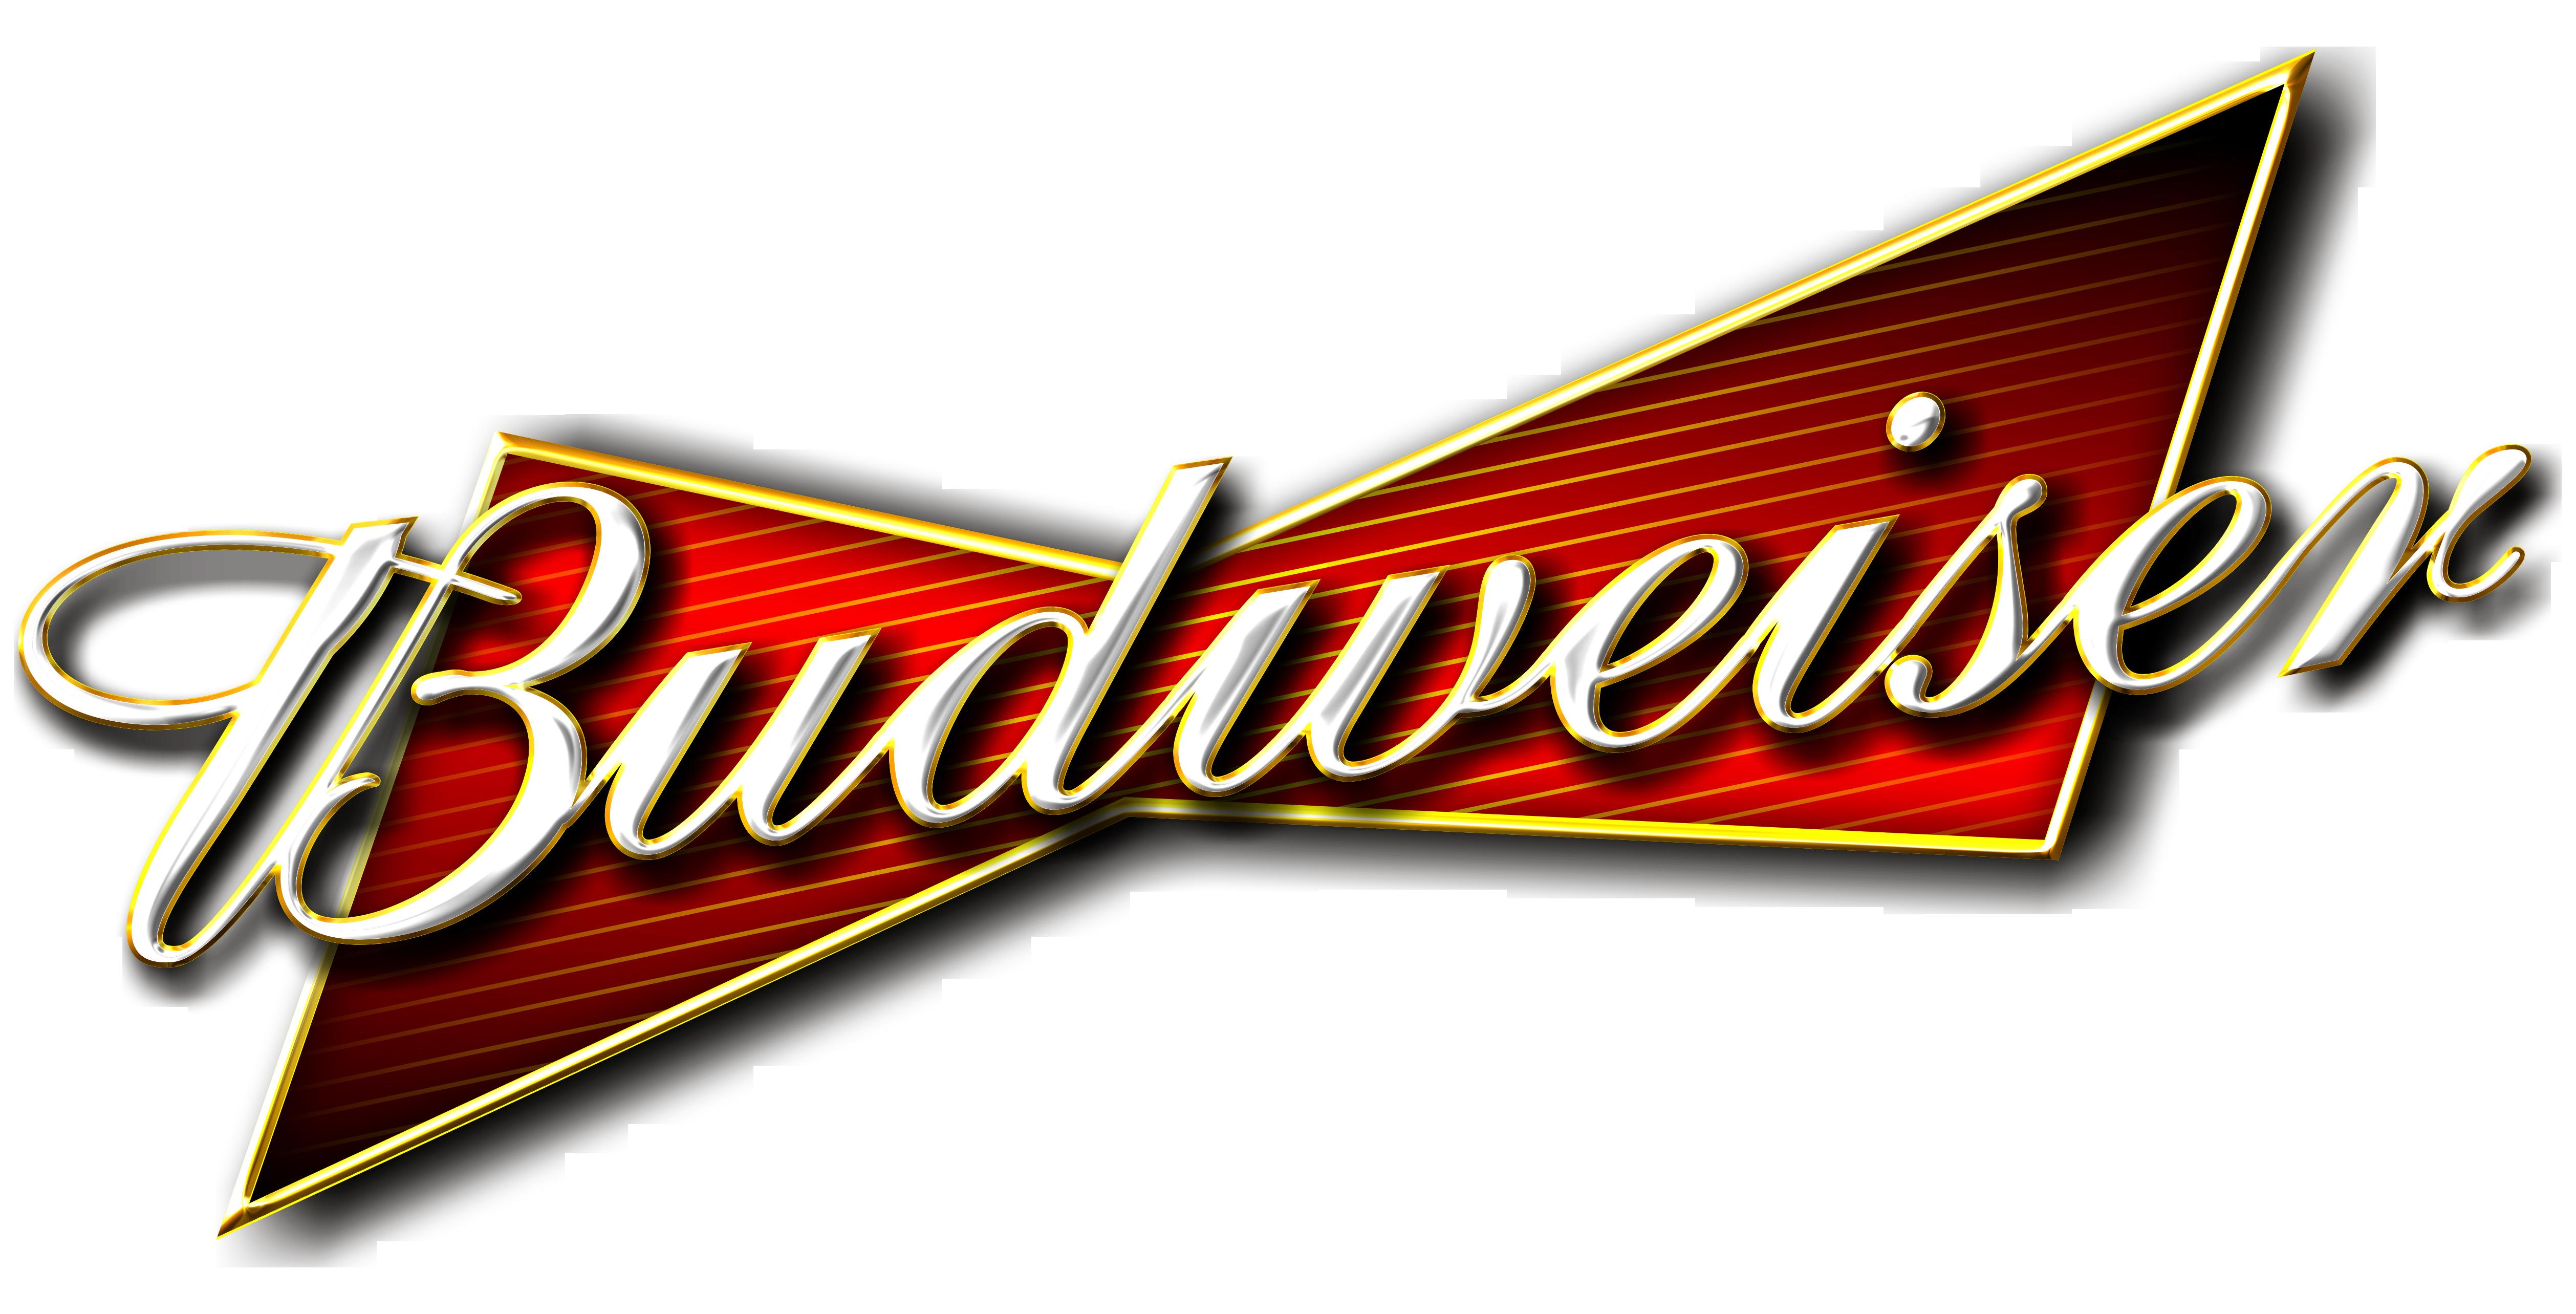 budweiser logo hd png fe pinterest logos and free rh pinterest com budweiser logo eps budweiser logo vector